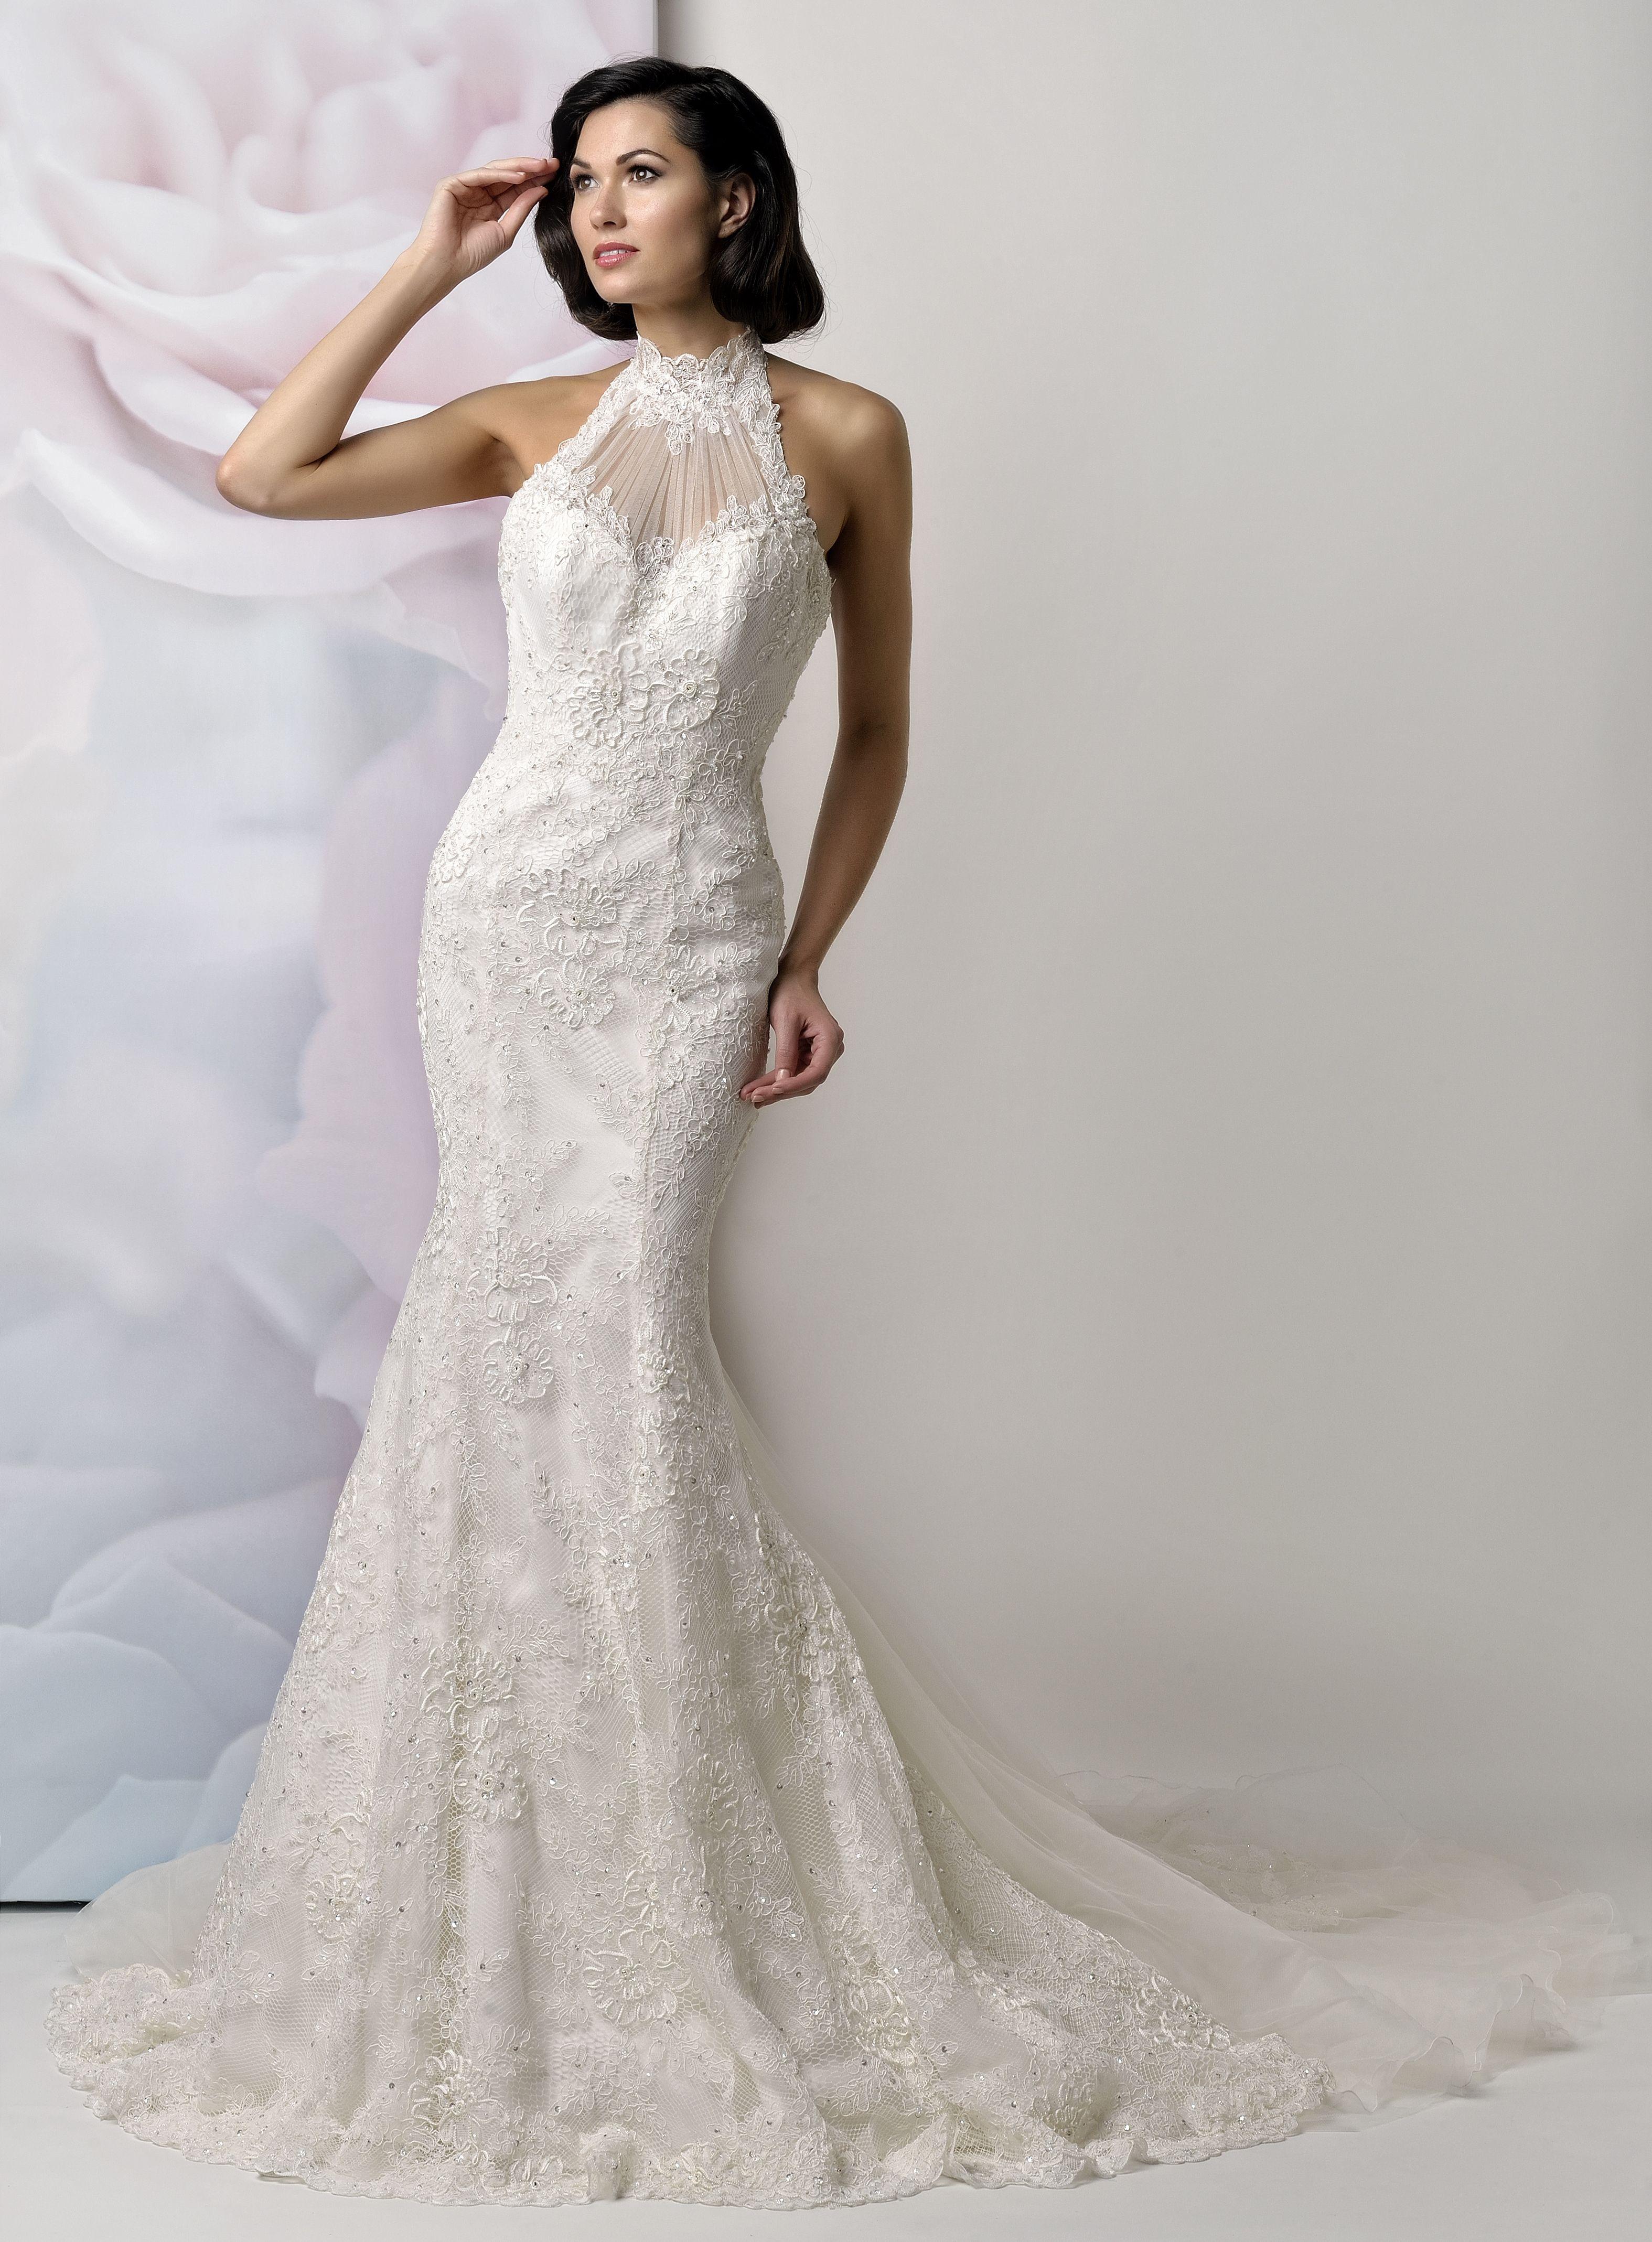 16+ Wedding dress overlay pattern info